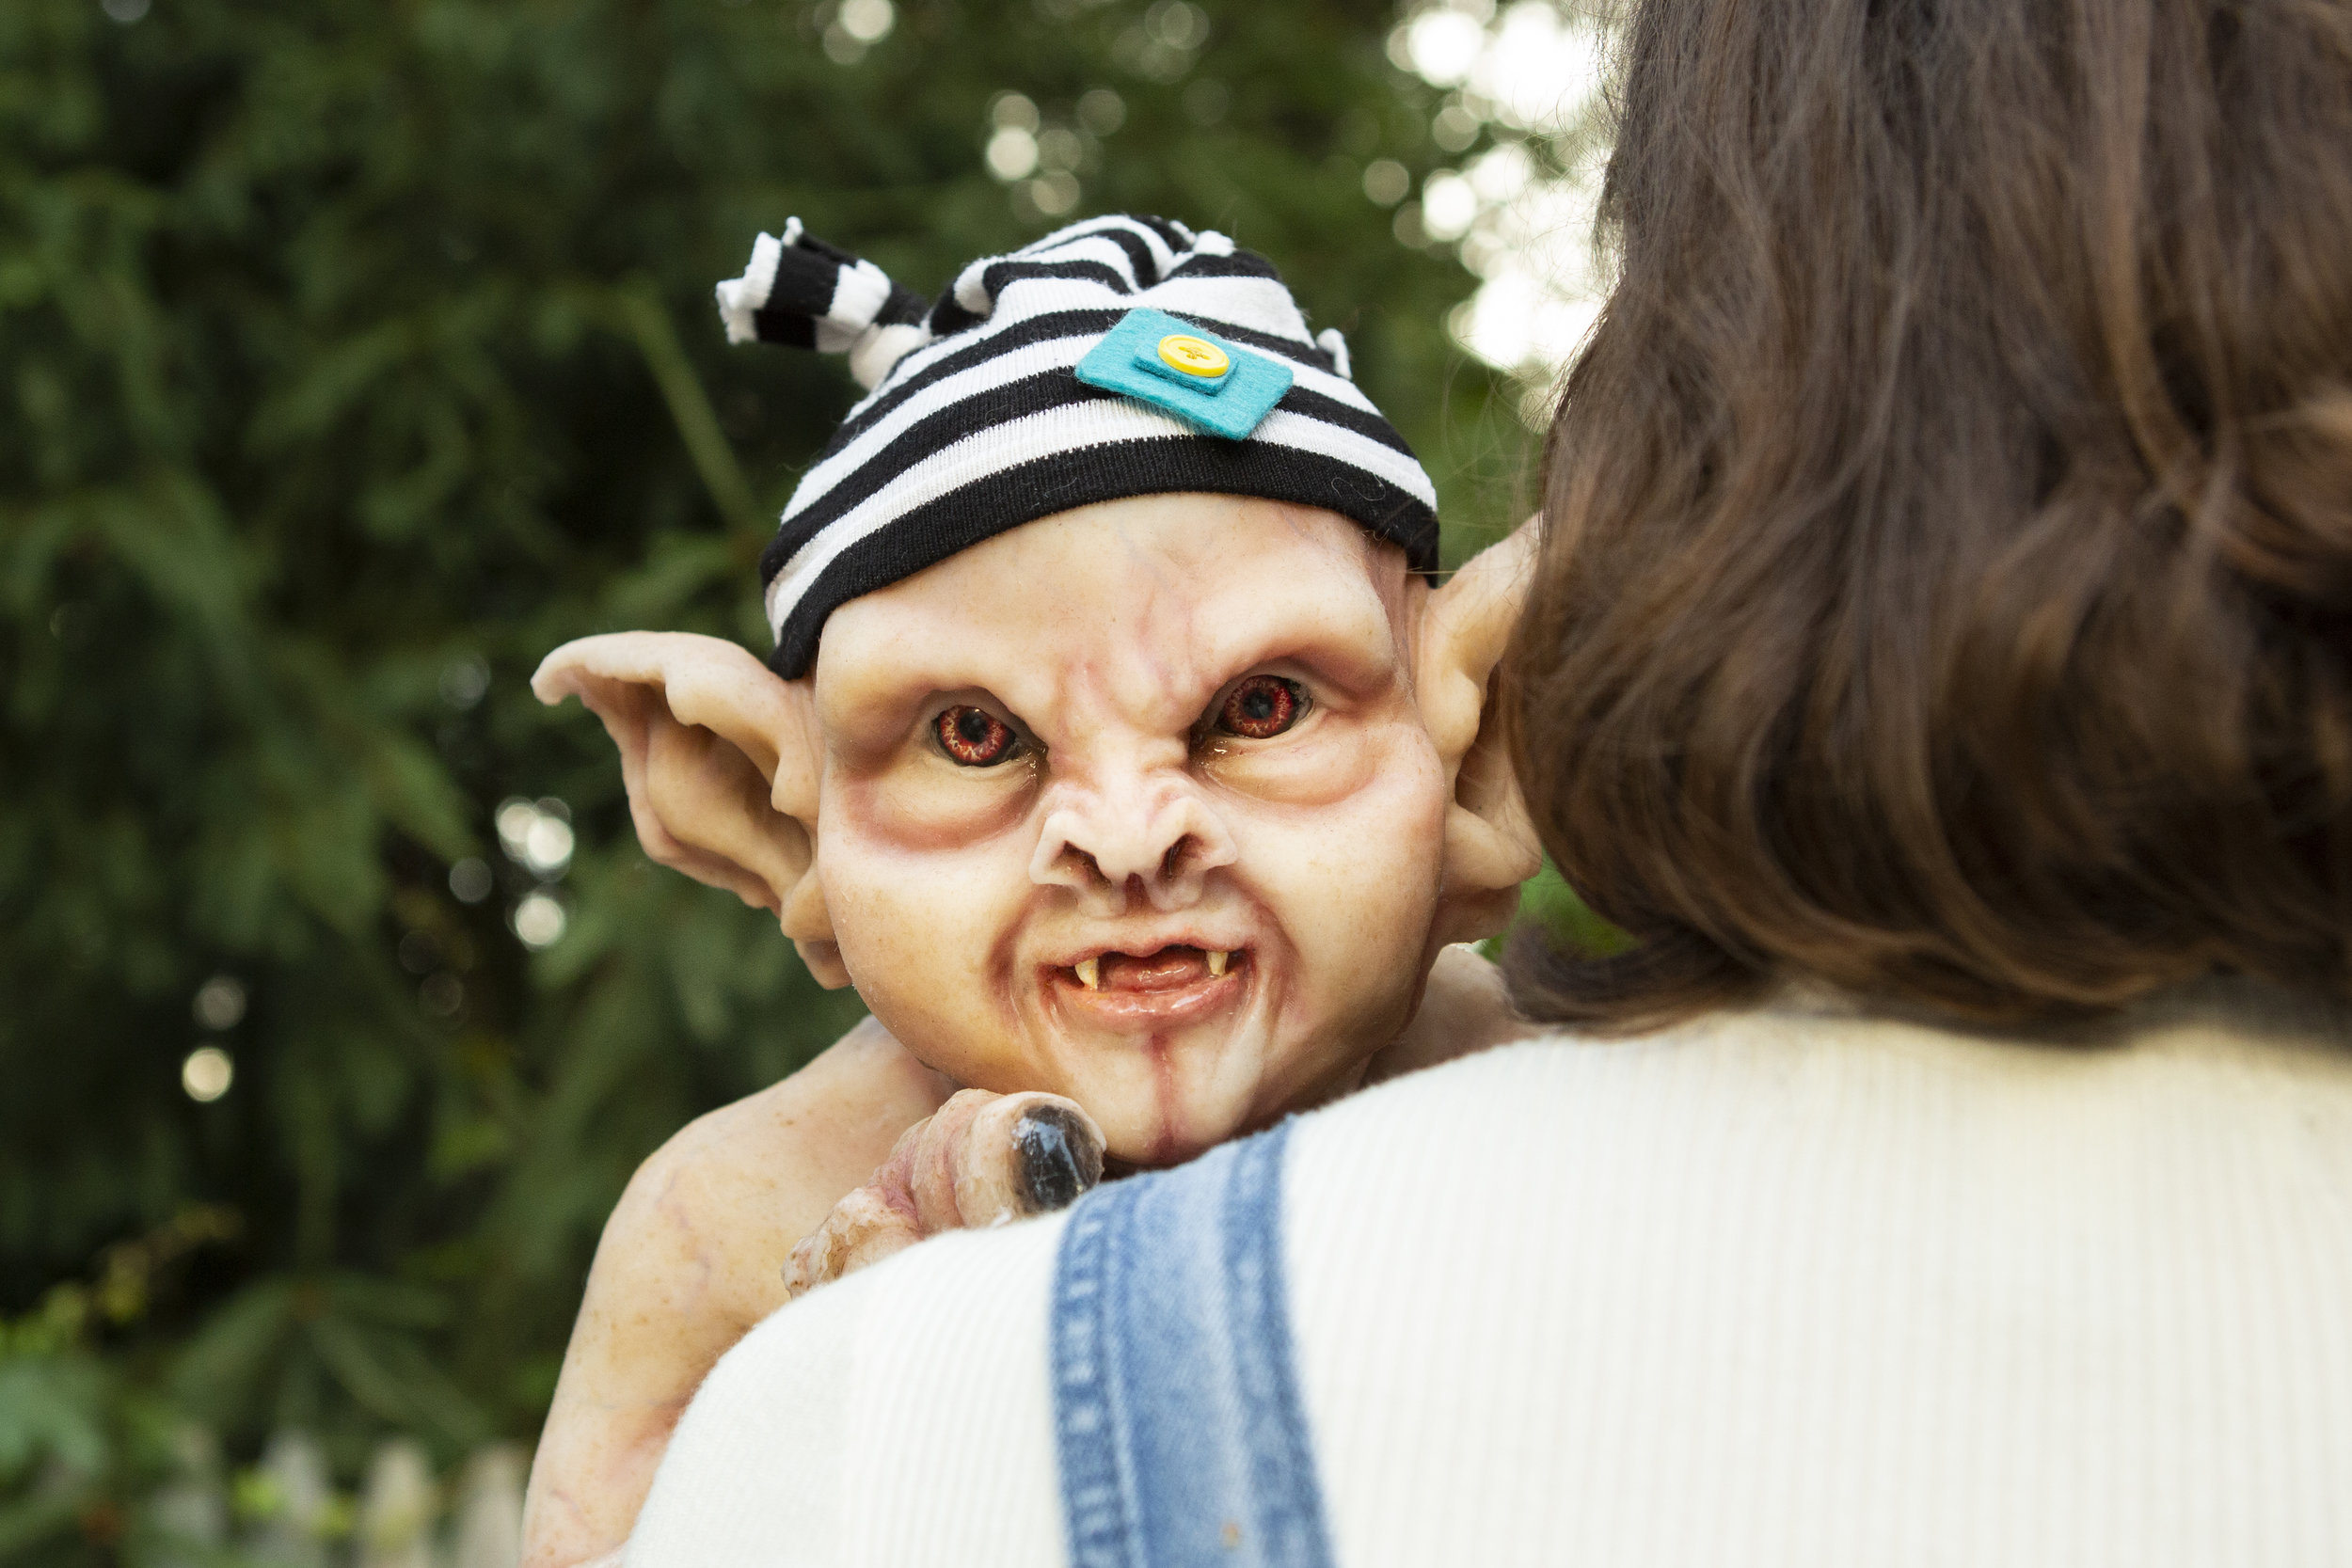 Fun Hats | Newborn Vampire  | Newborn photoshoot | Ravendark Creations Vampire Baby | Newborn Photoshoots | Alyssia Booth's Candid & Studio | www.abcandidstudio.com